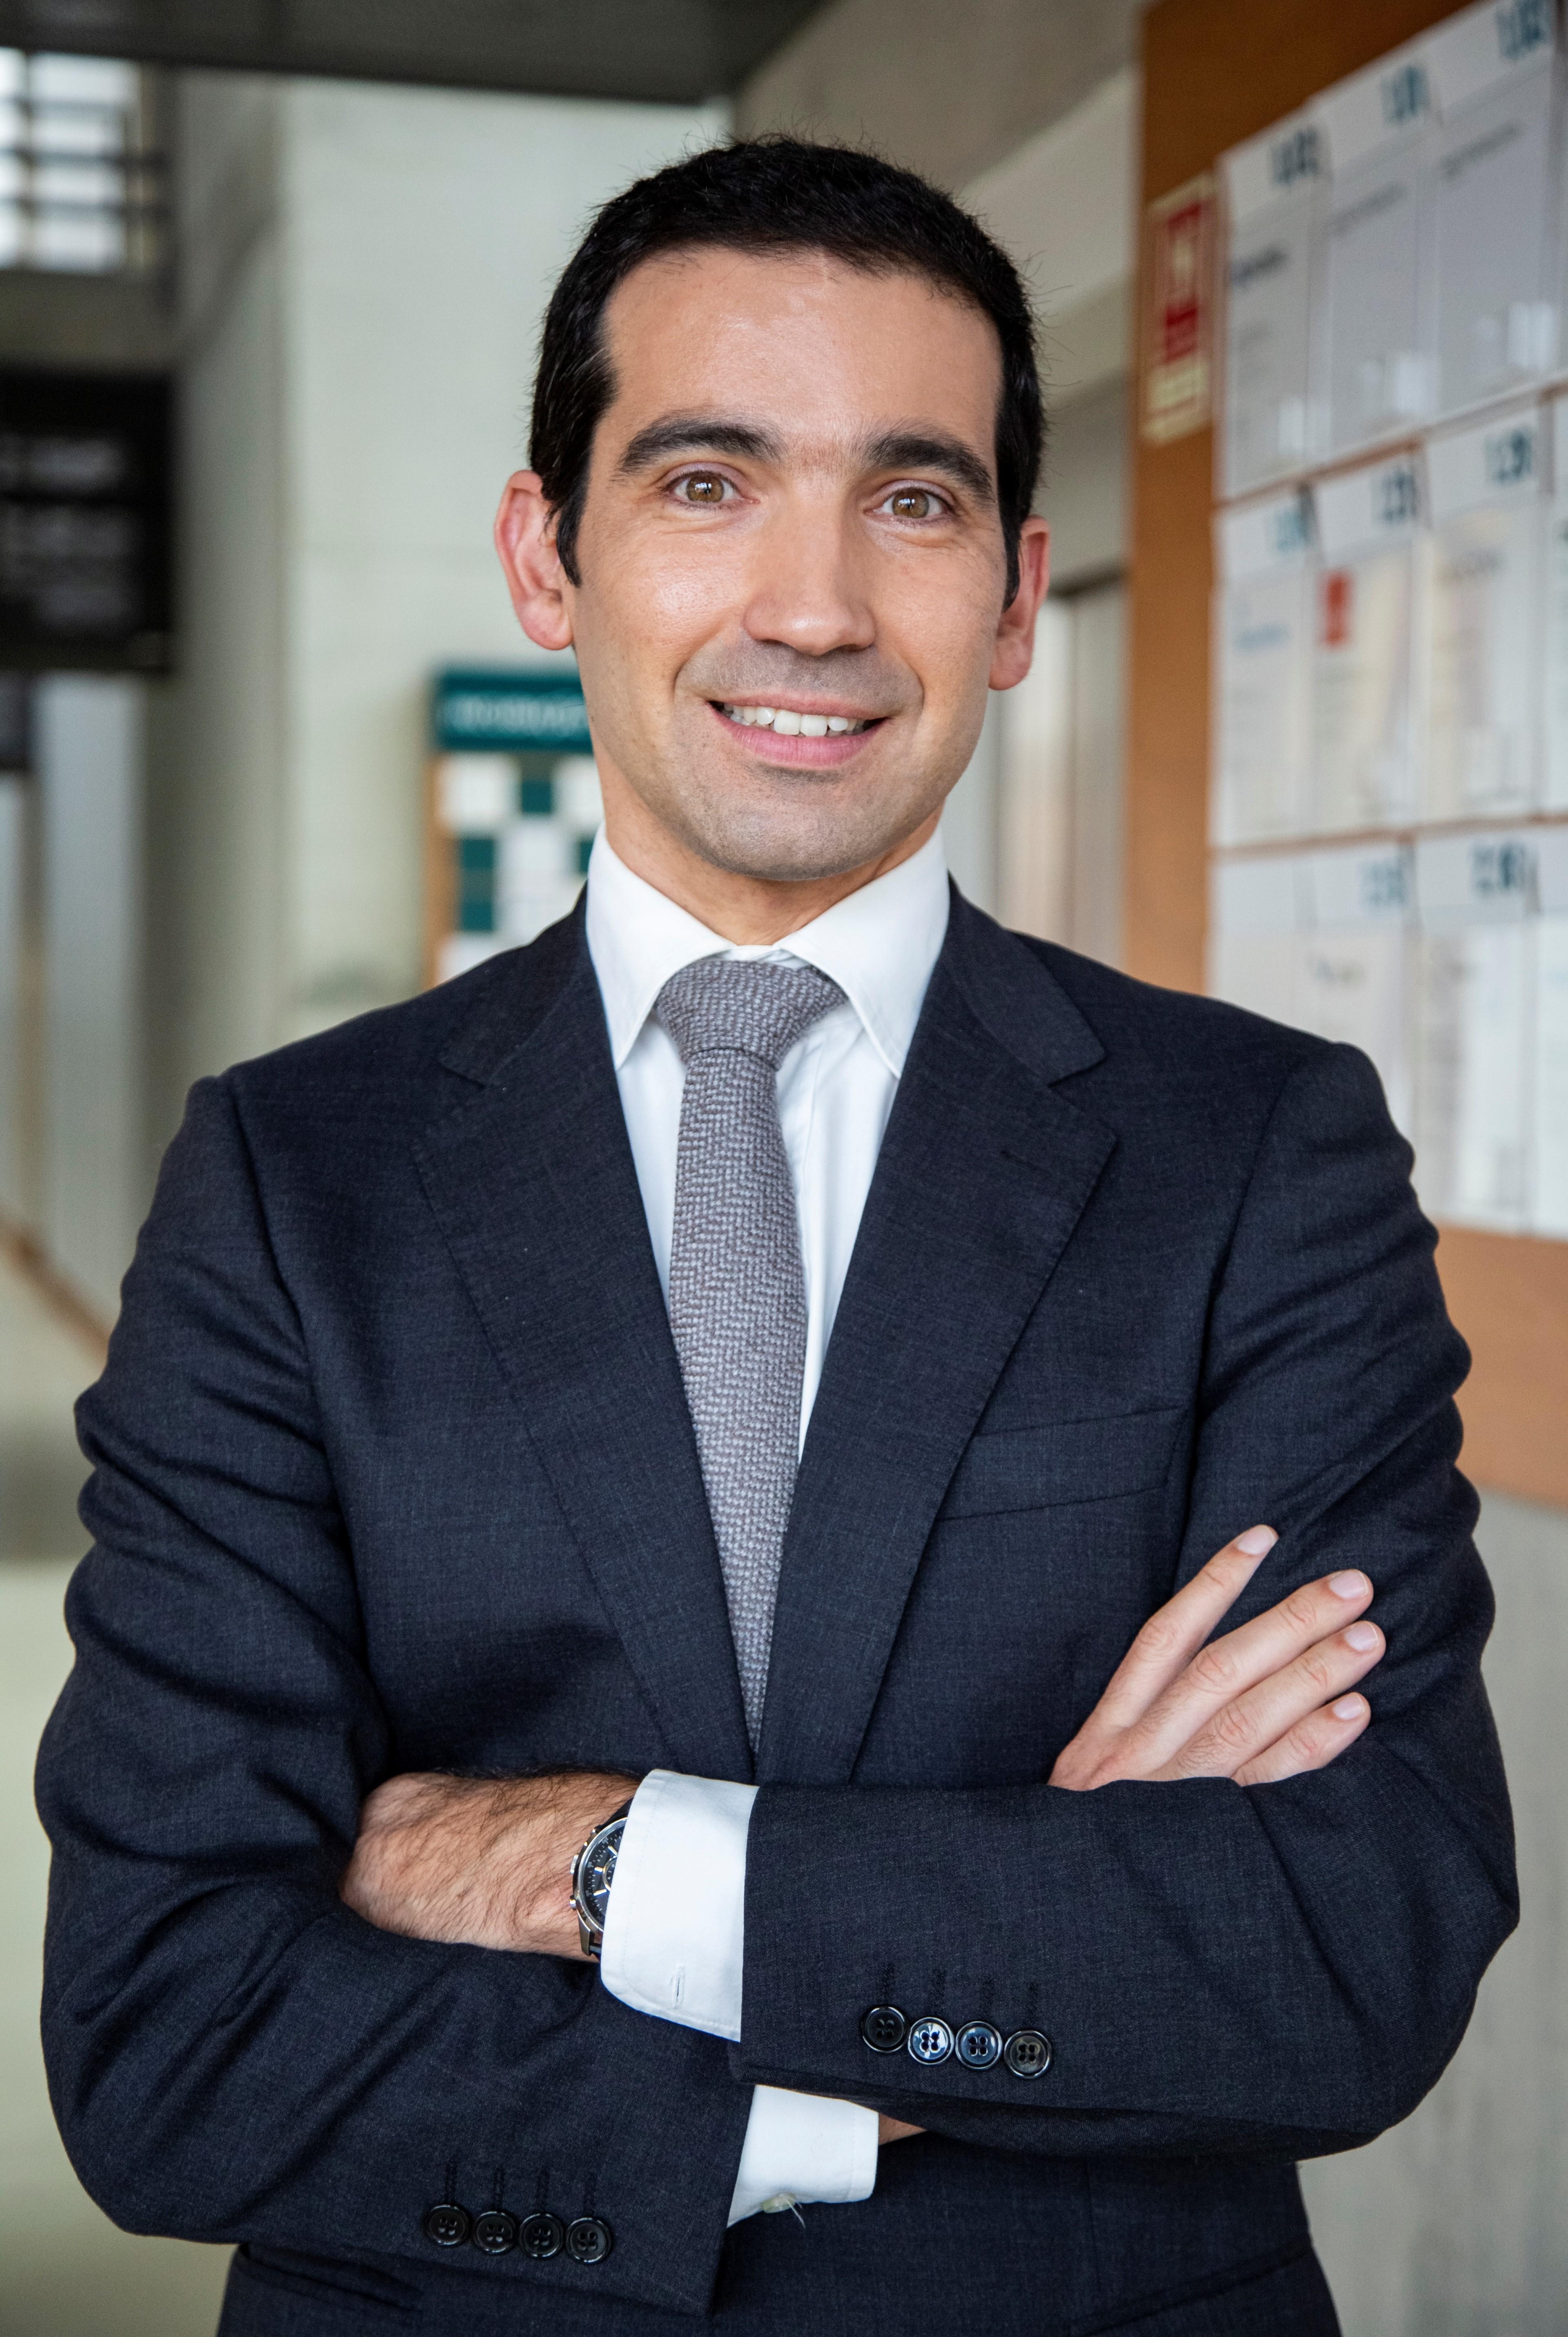 Jorge Pimenta (IPN, EBN)